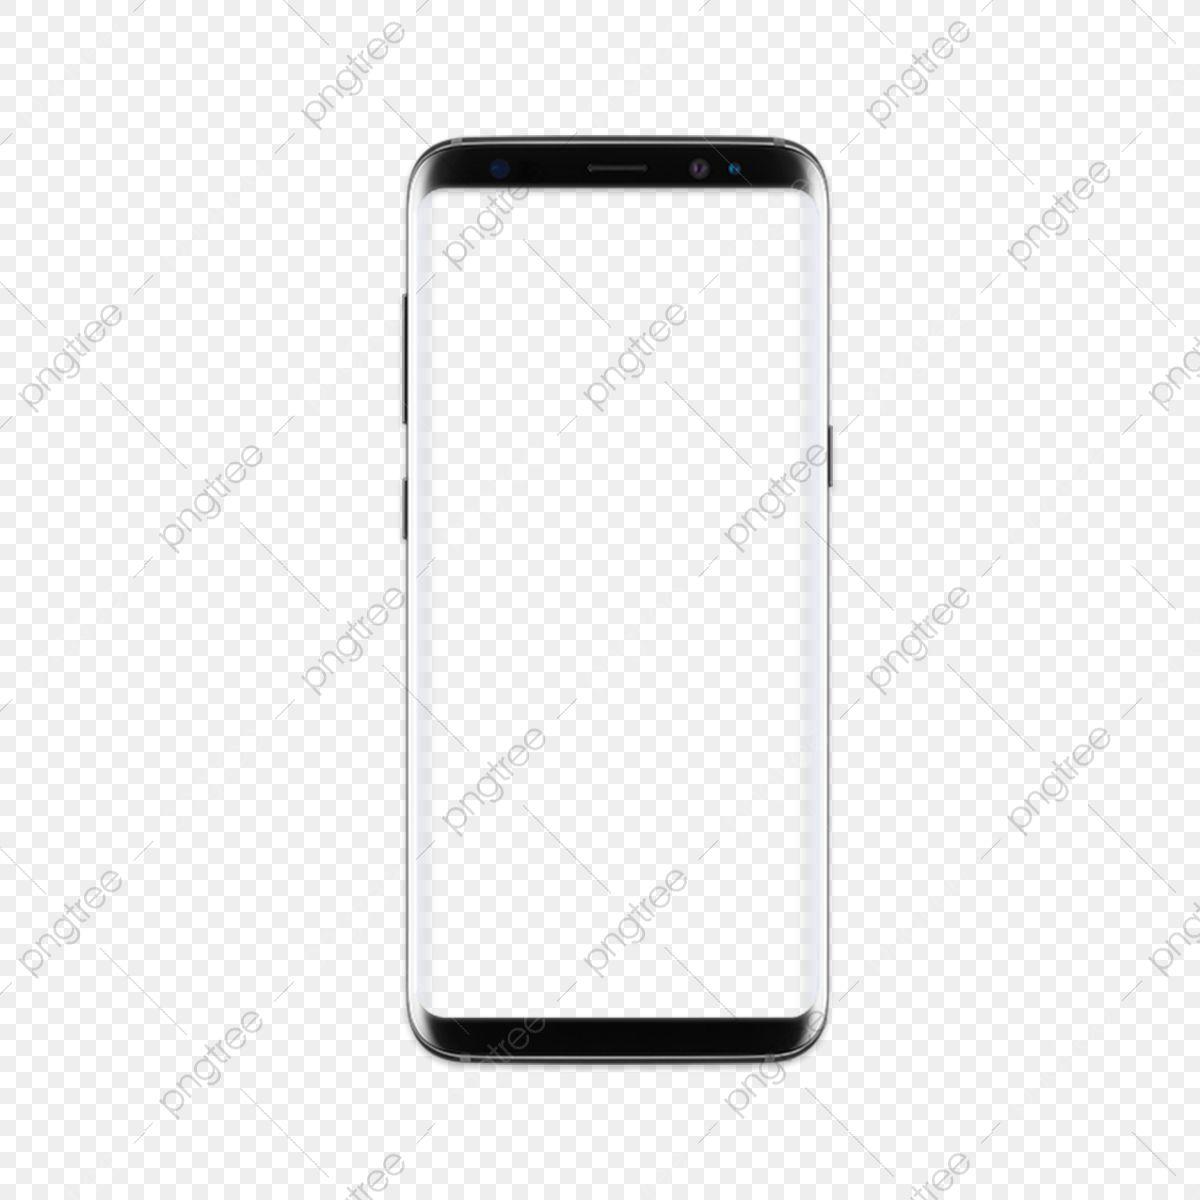 Samsung Mobile Frame Png Samsung Mobile Samsung Mobile Photos